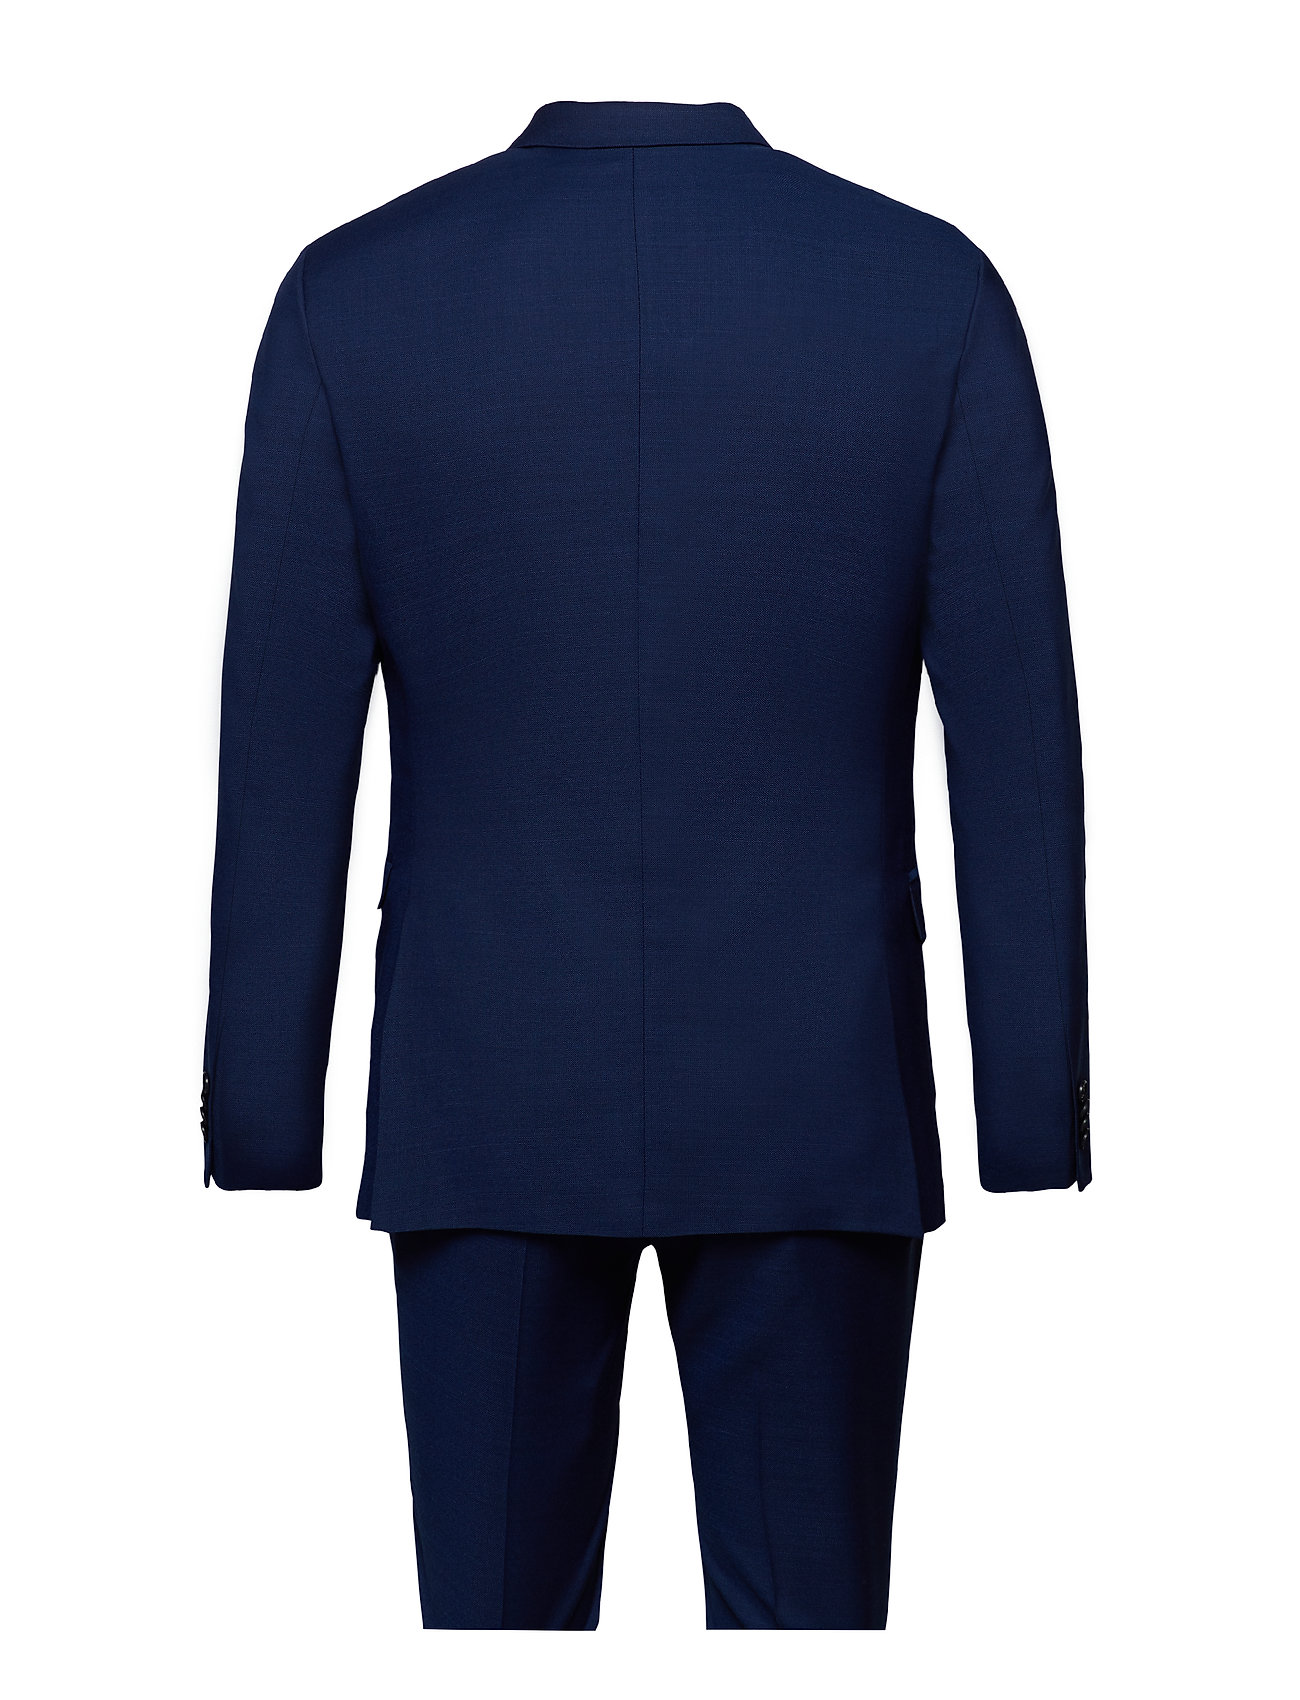 acd48b1c5c47 Jprsolaris Suit jakkesæt fra Jack   Jones til herre i Sort - Pashion.dk